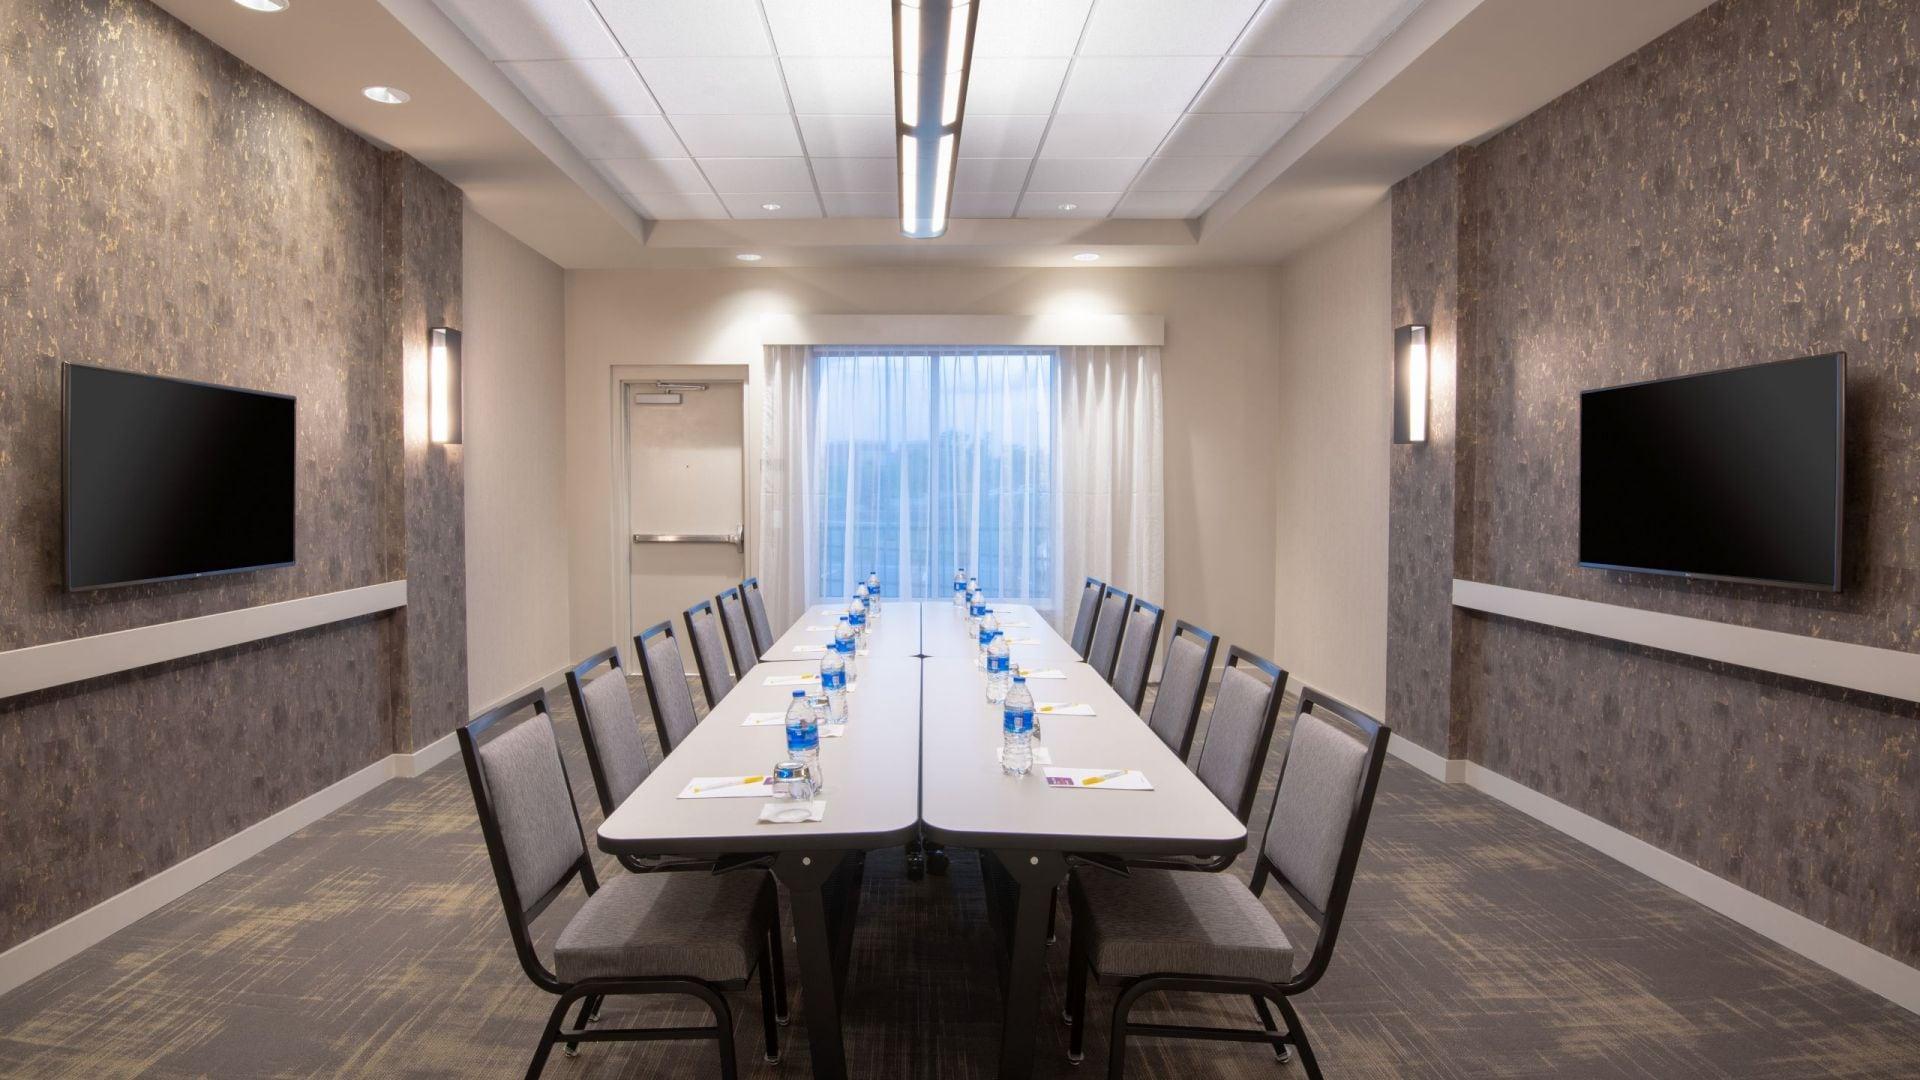 Hyatt Place Denver / Westminster Boardroom